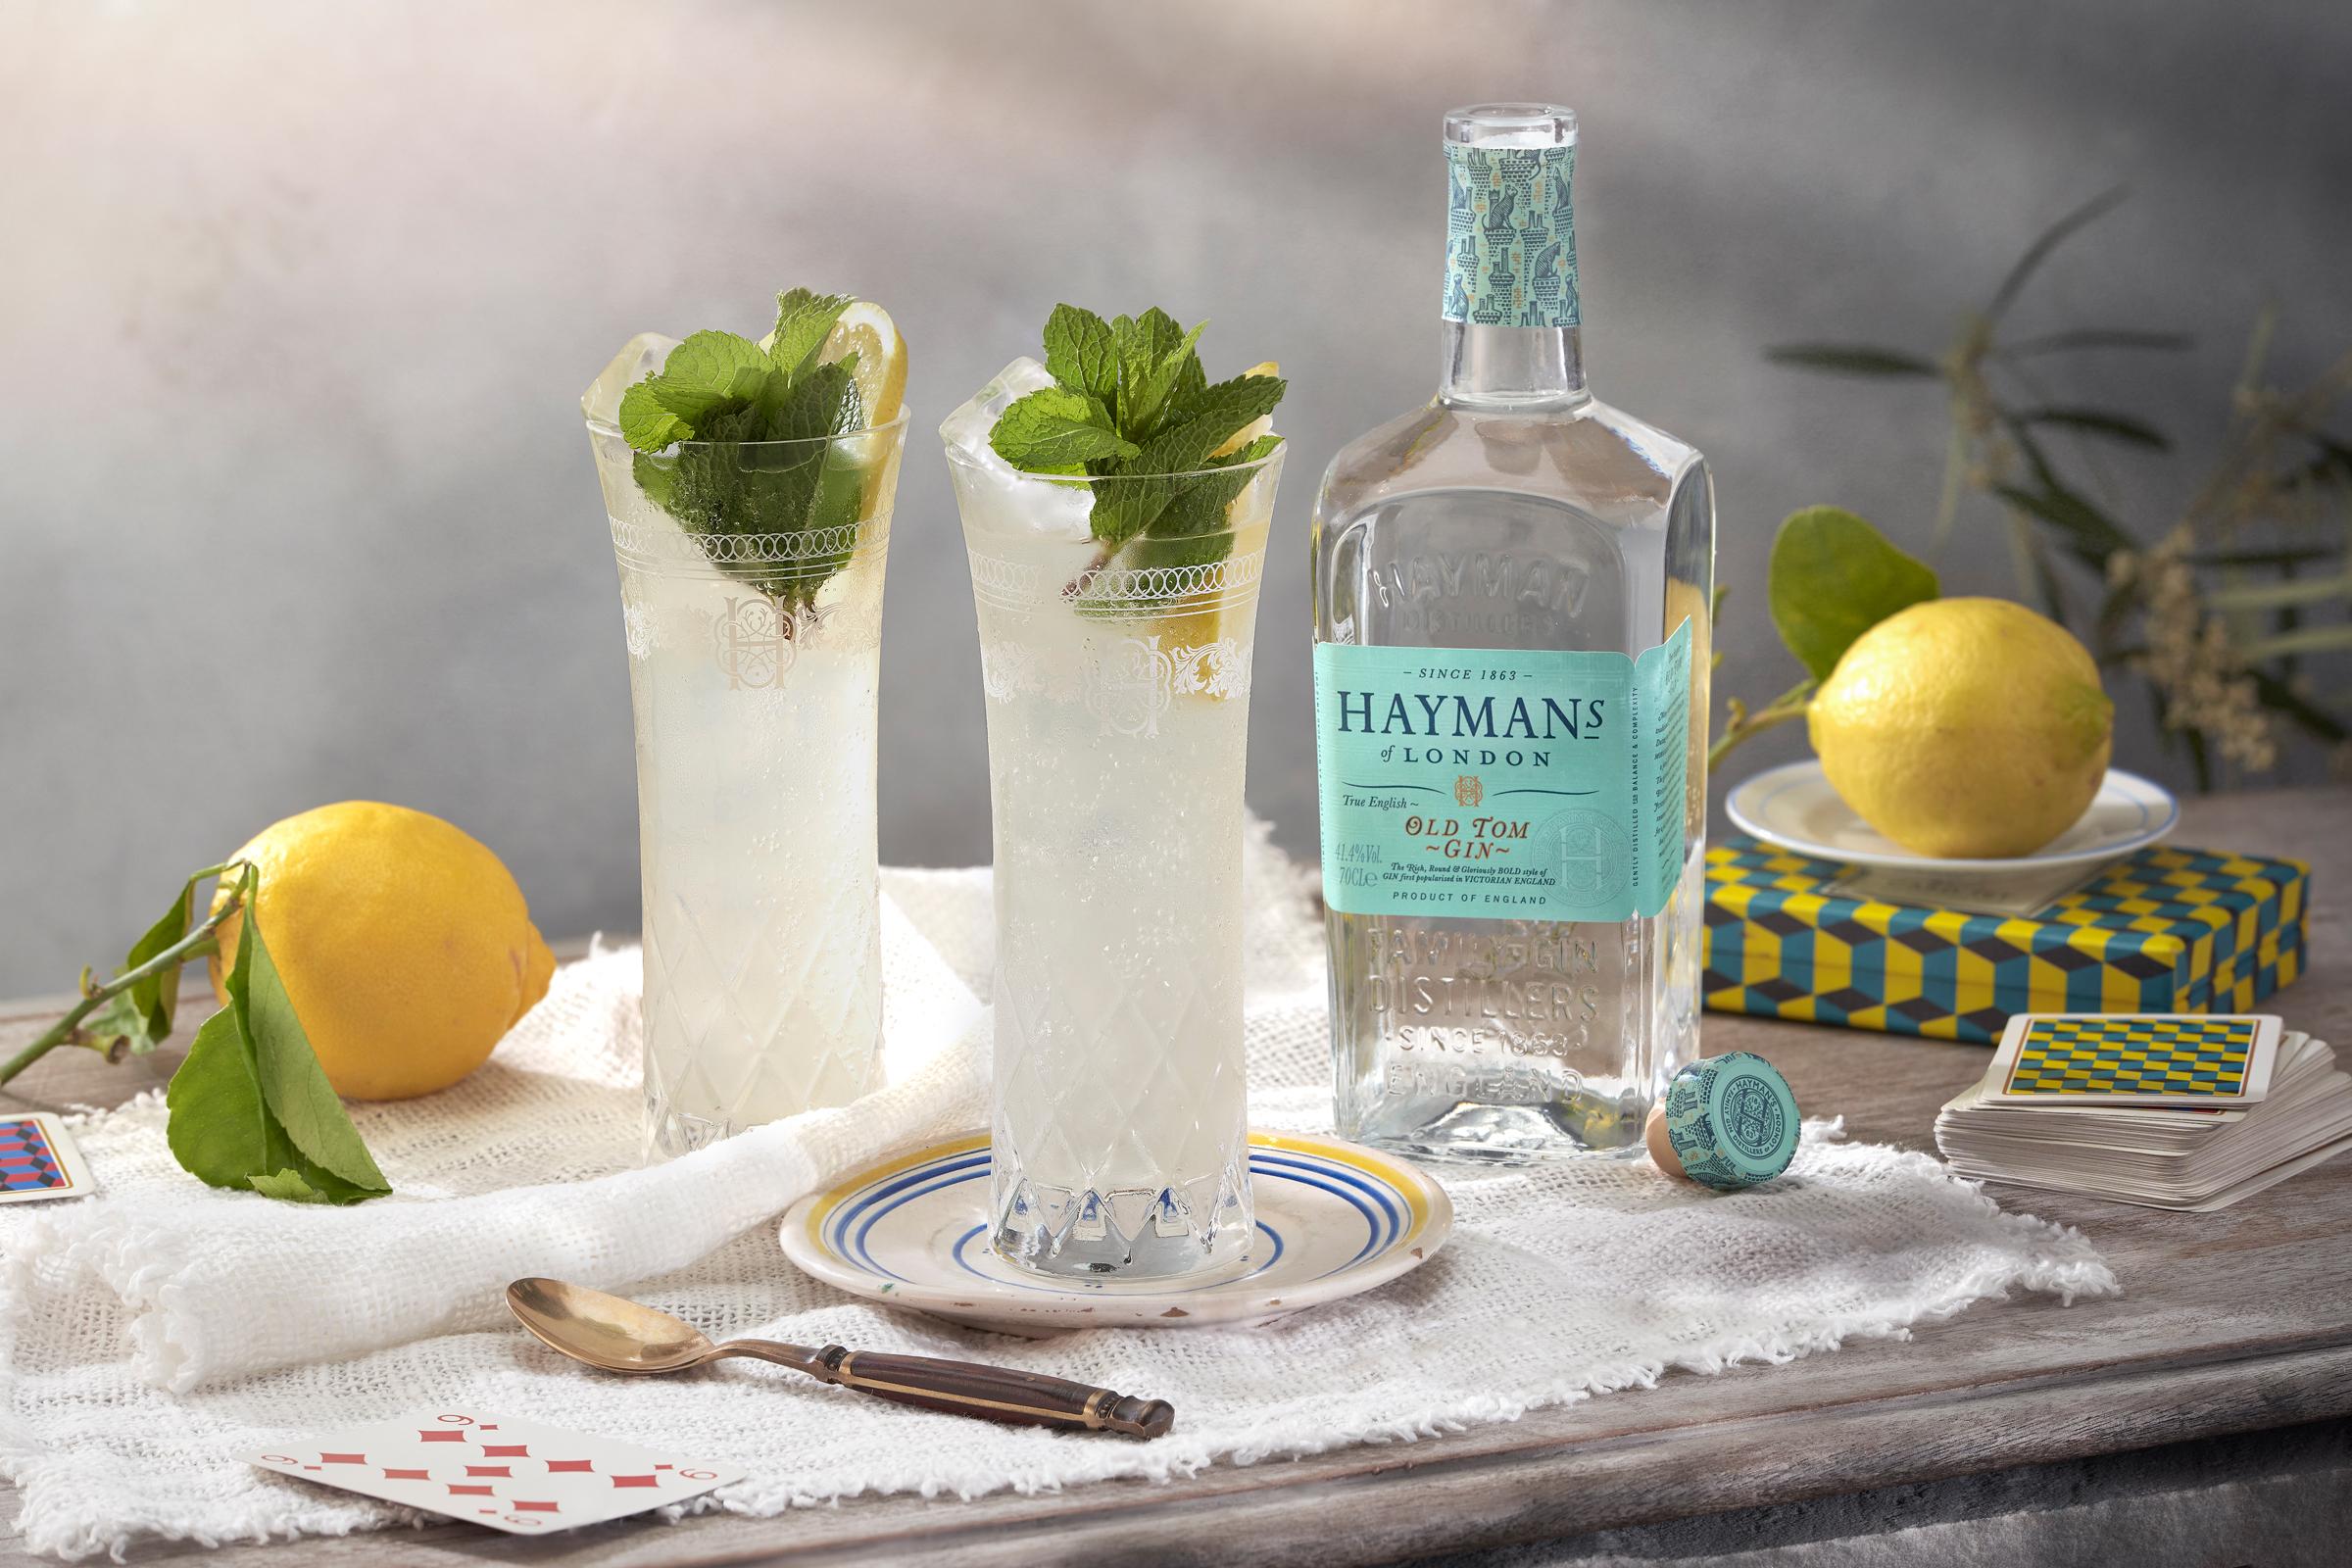 Hayman's Old Tom and Lemon Tonic